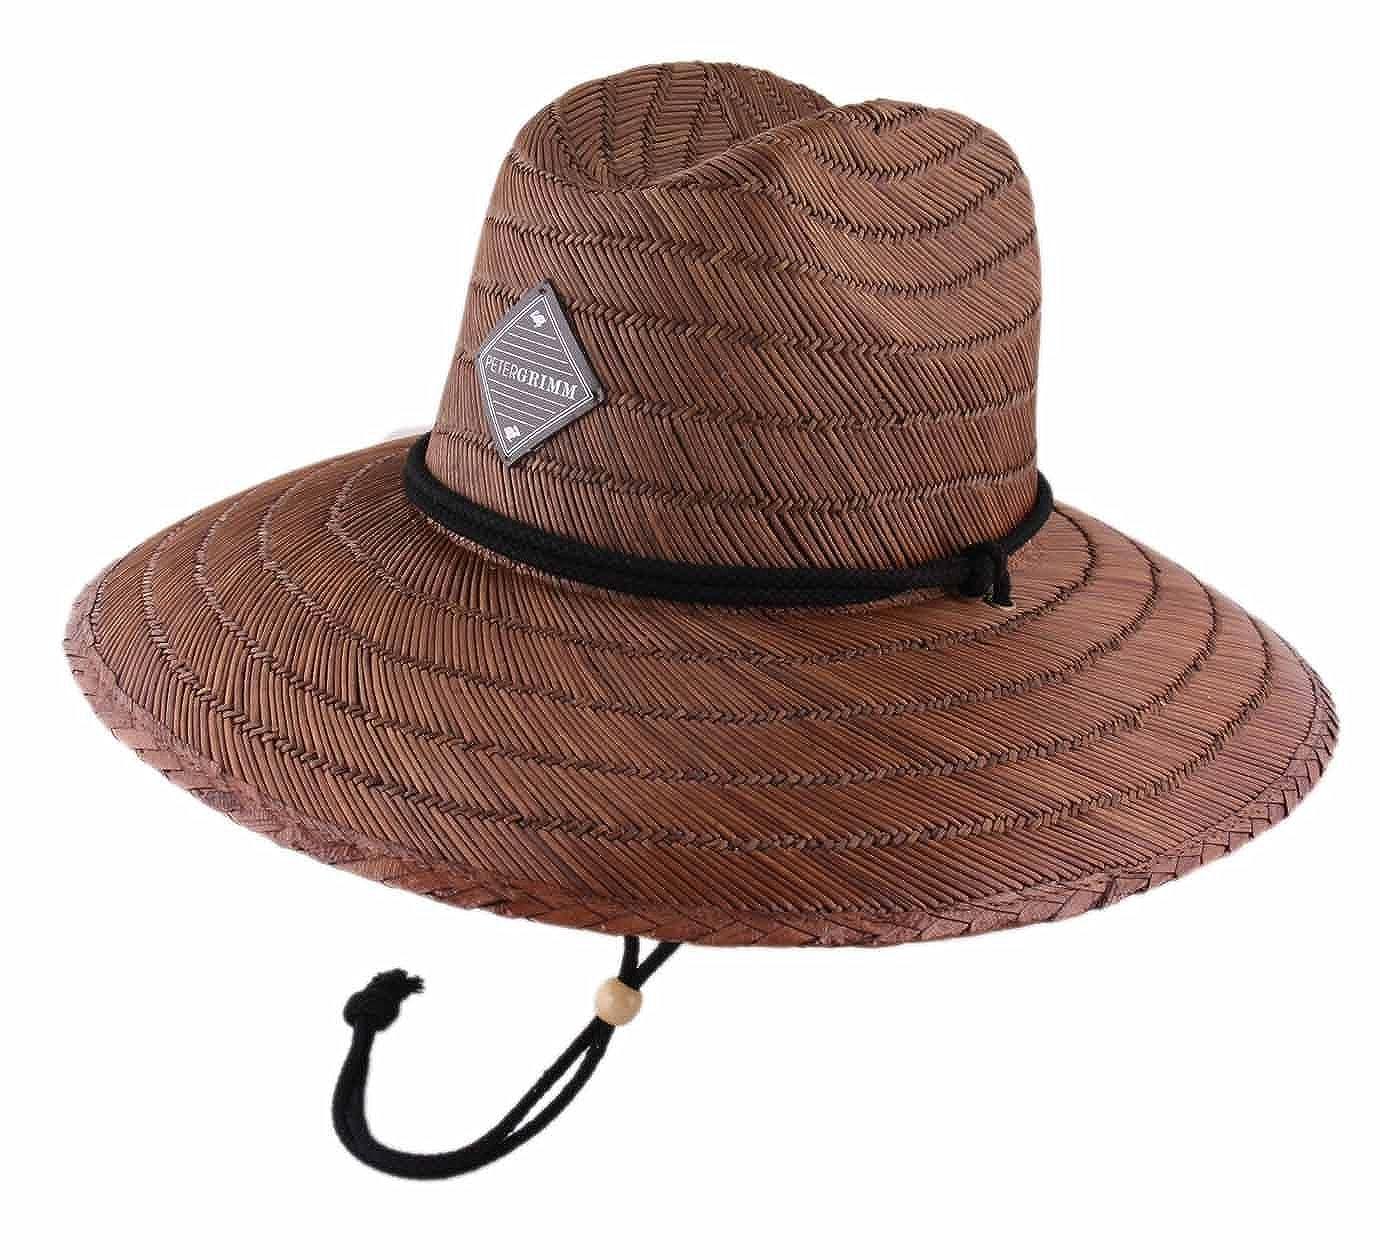 Chapeau Fedora Paille Large Bord Homme ou Femme Boho Safari Peter Grimm